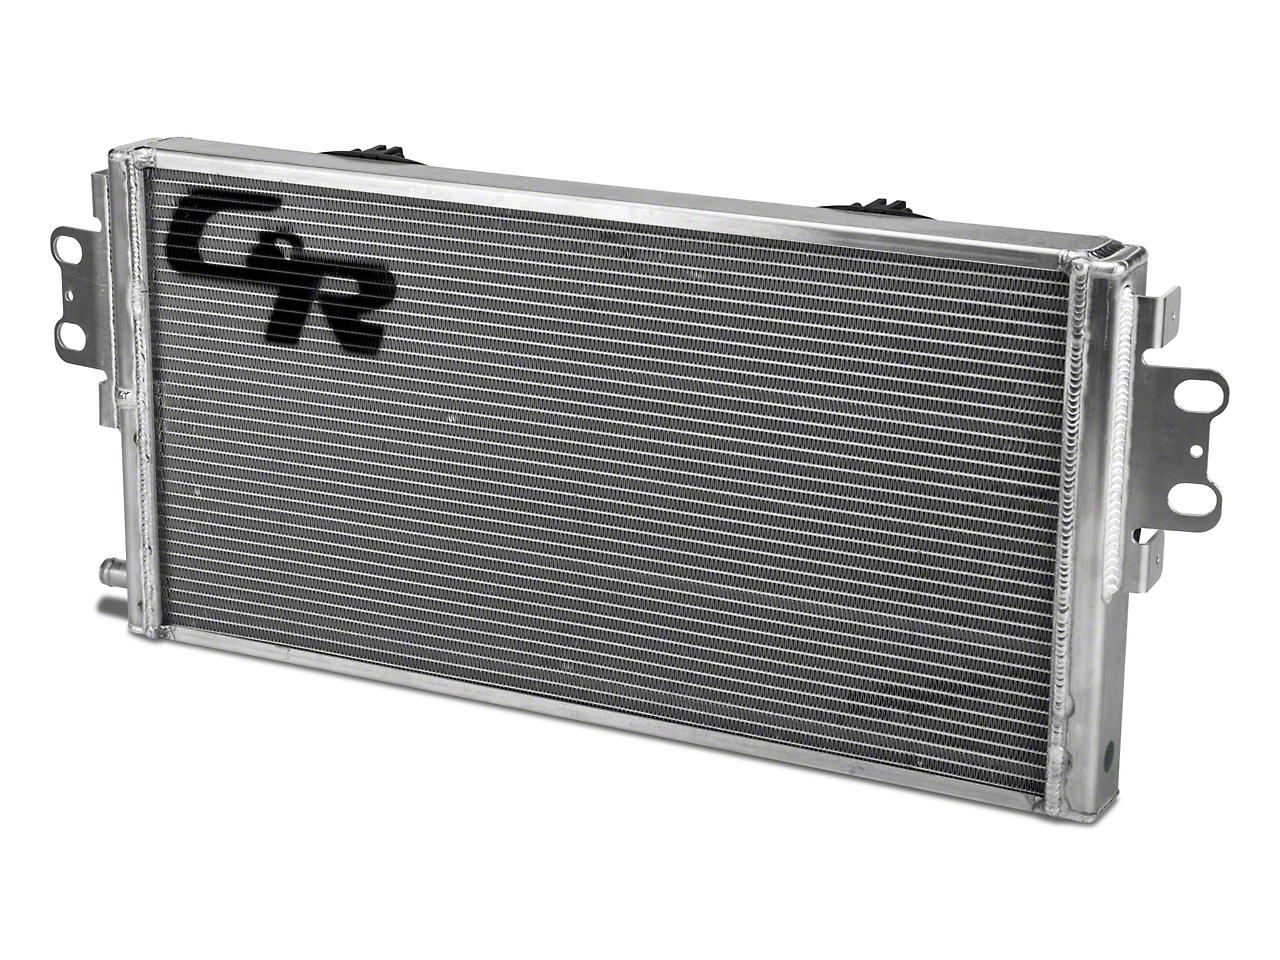 C&R Racing Heavy Duty Dual Pass Heat Exchanger w/ Dual Fans (07-14 GT500)